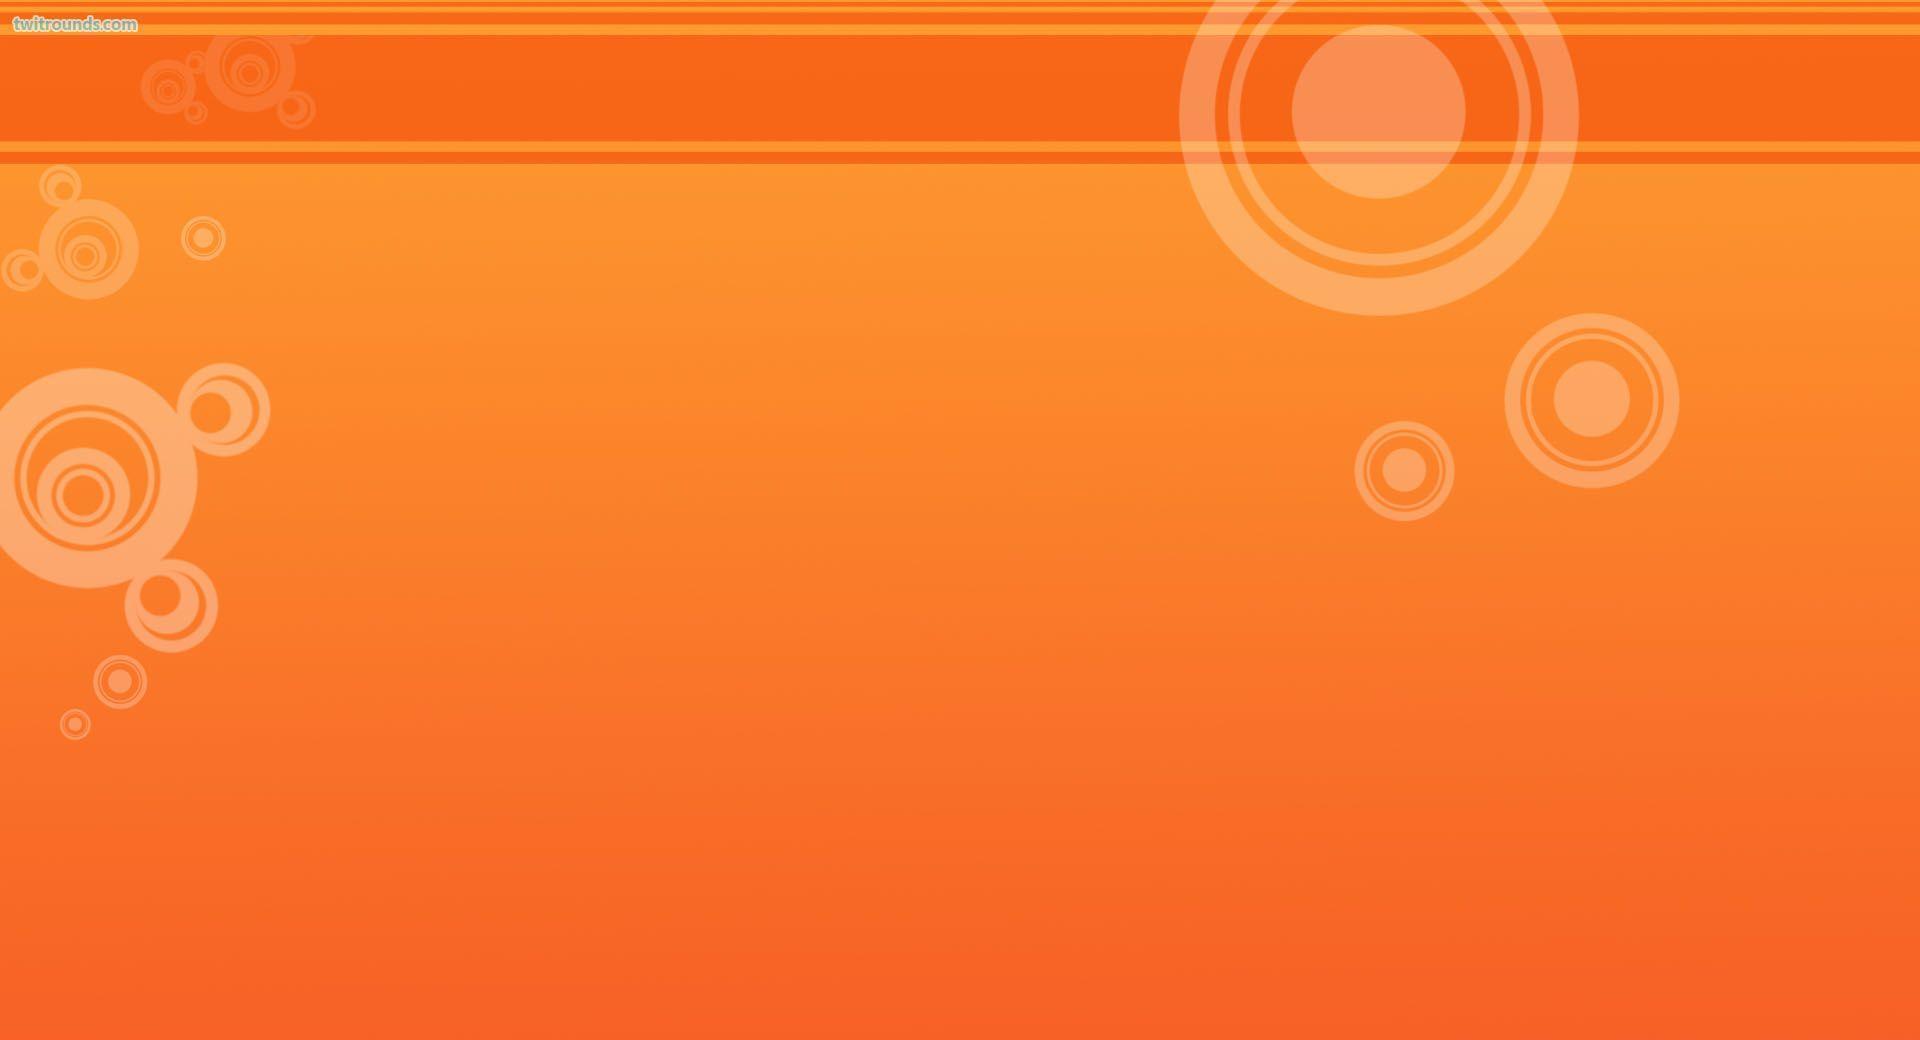 orange wallpaper06 - photo #42